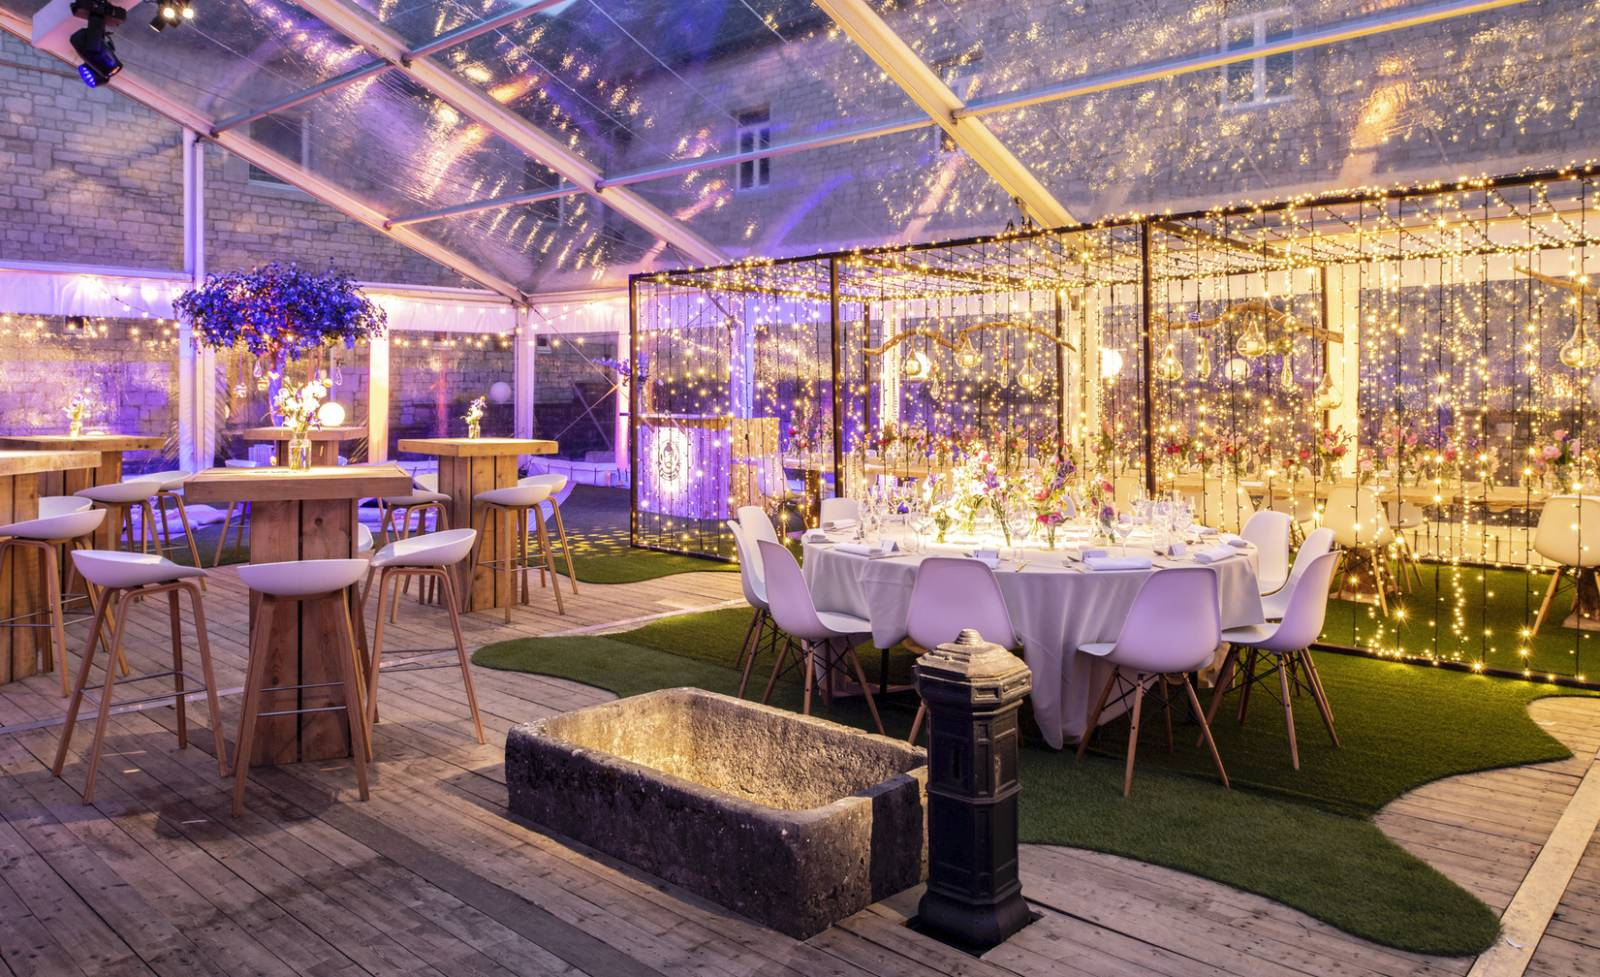 Five Nations Golf Club & Hotel - Durbuy - Feestzaal - Trouwzaal - Trouwlocatie - House of Weddingsh800-7727766fRbWcwS